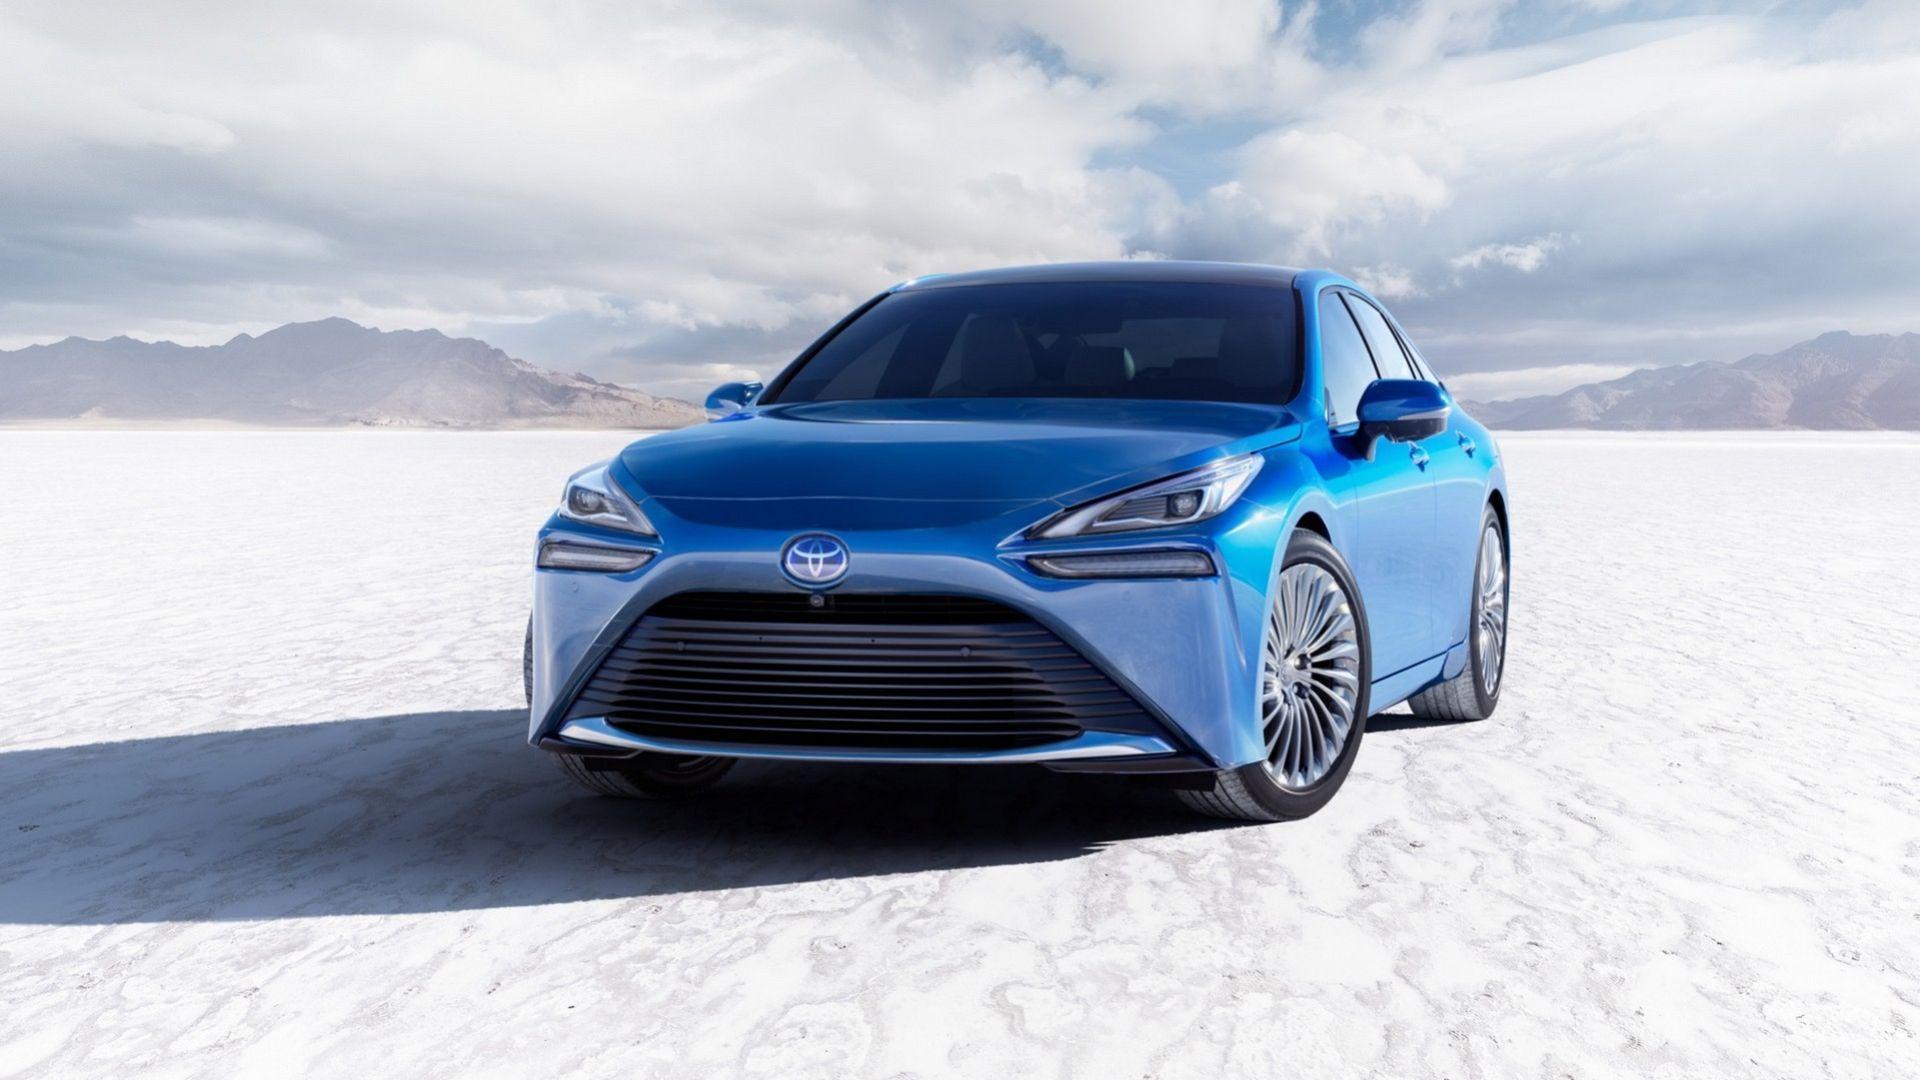 Nya Toyota Mirai i produktionsutförande